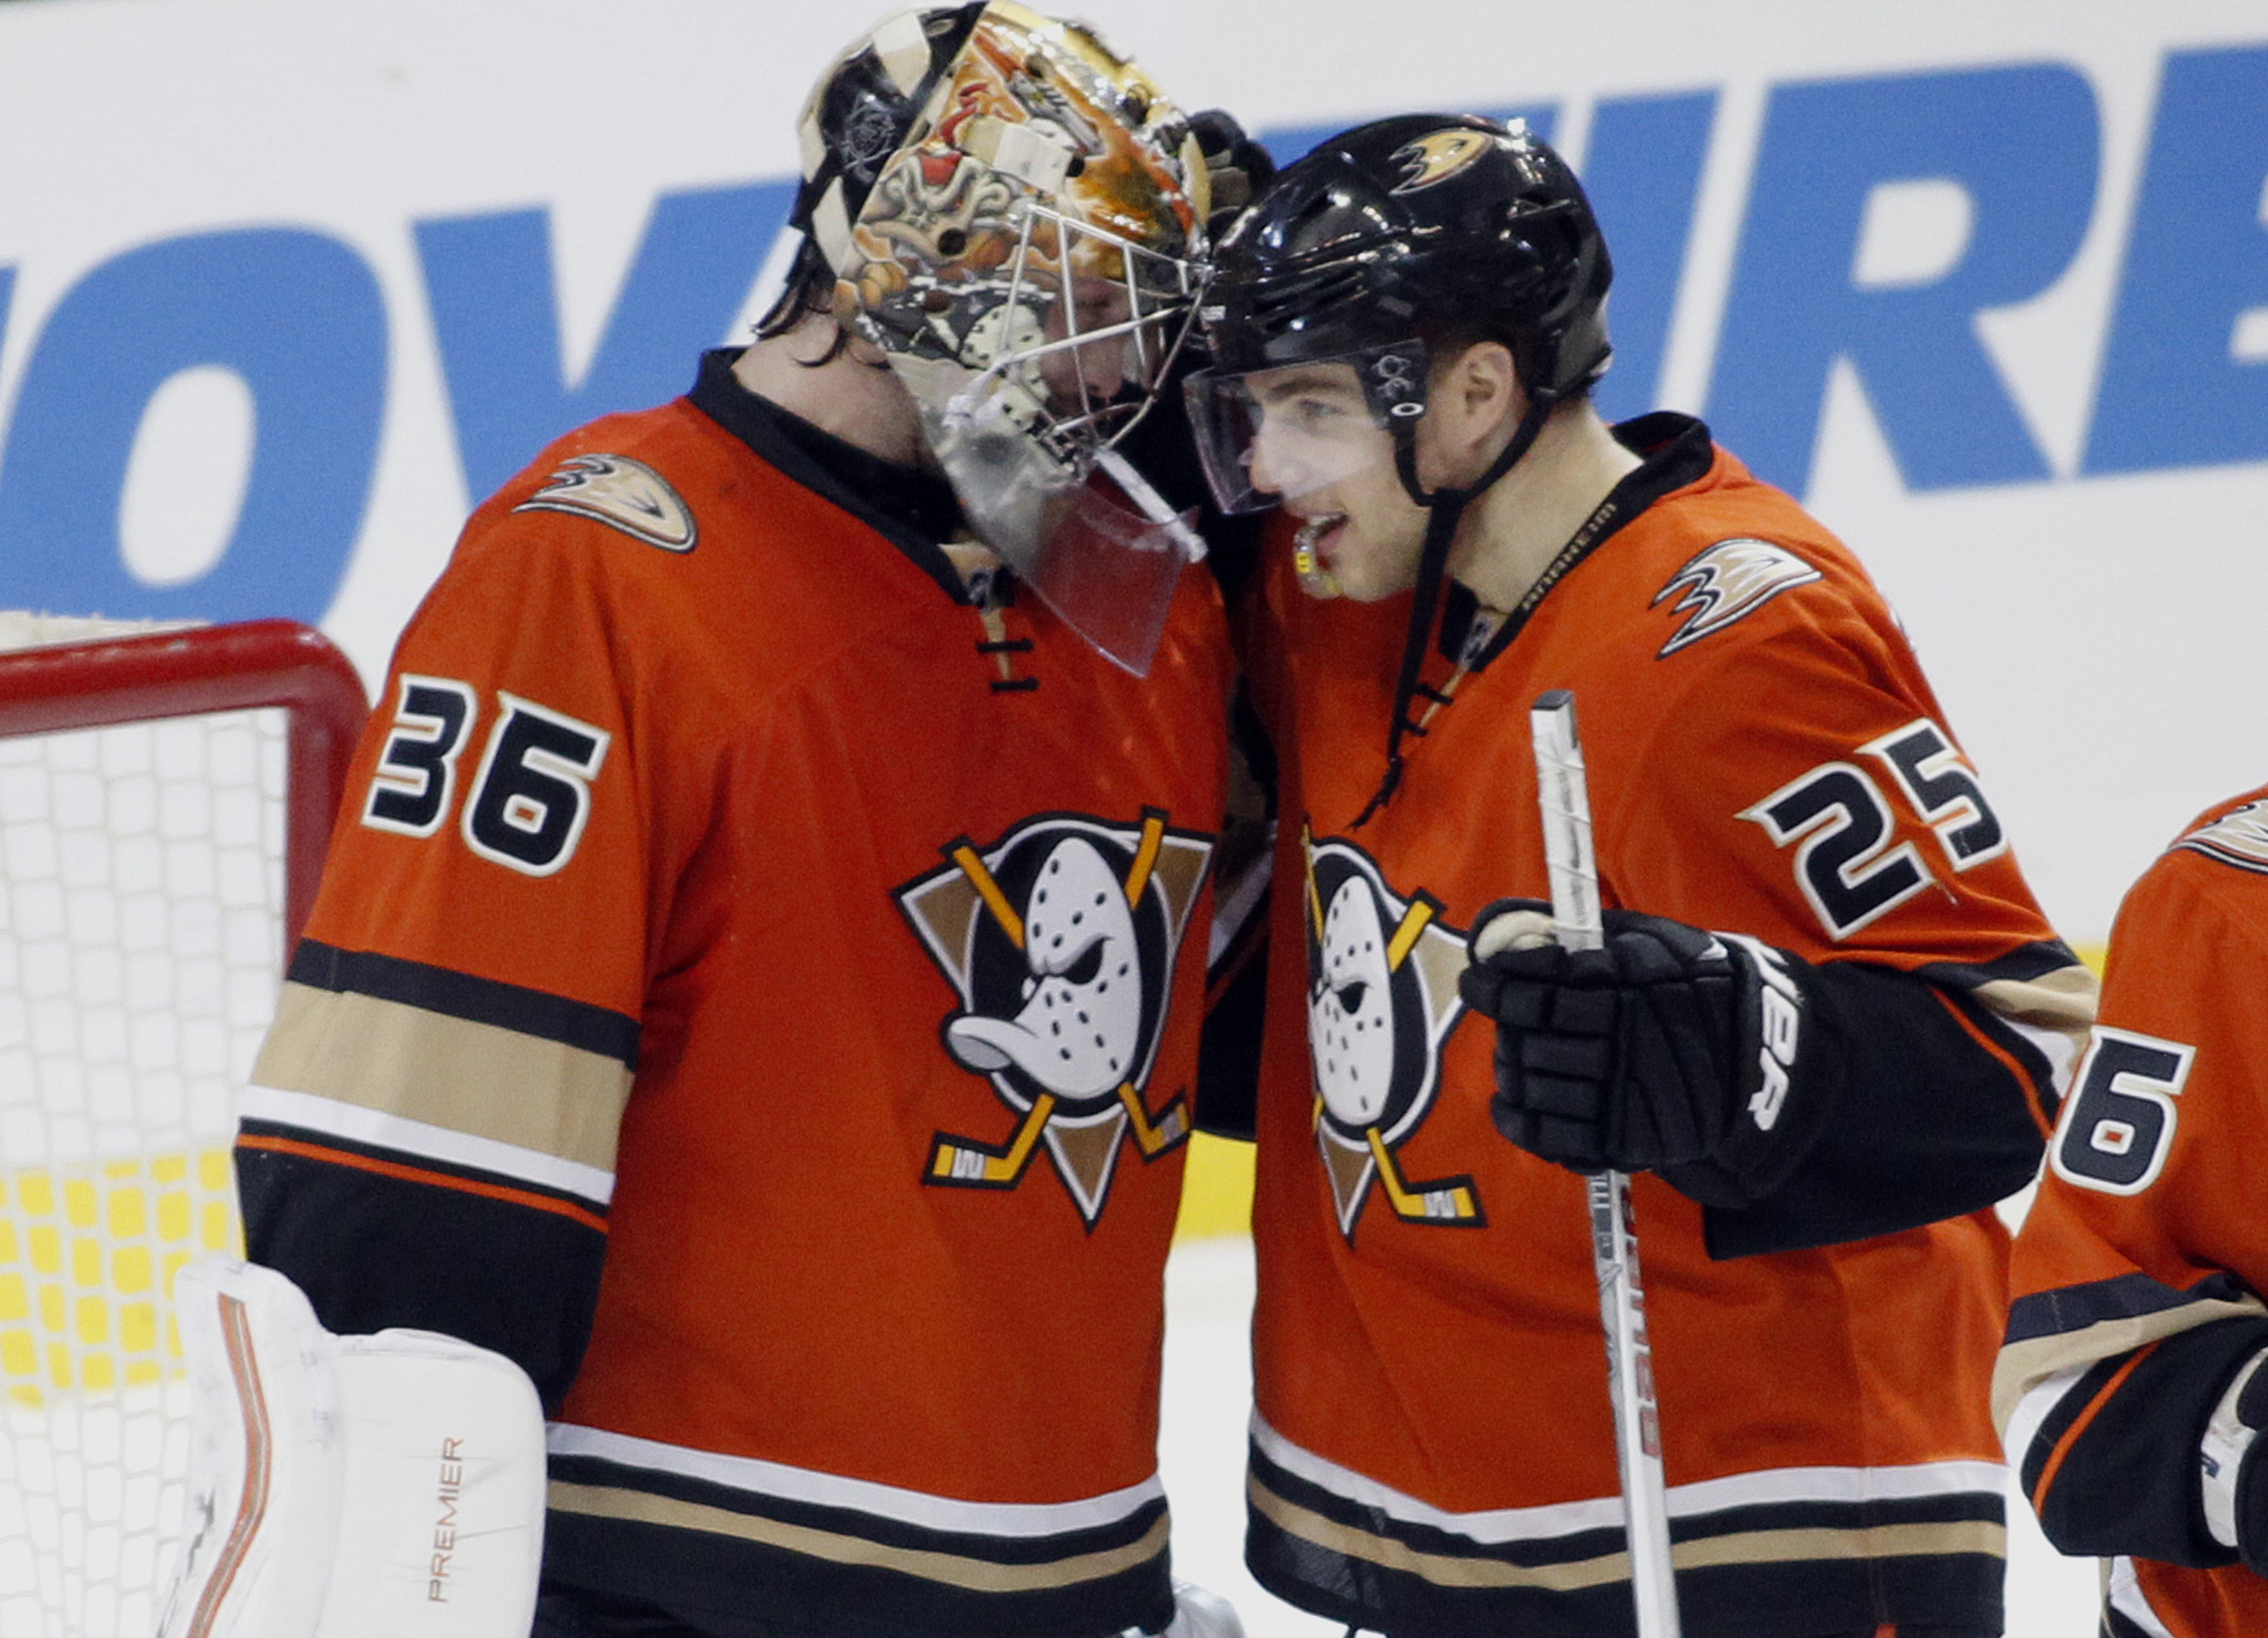 Penguins_ducks_hockey